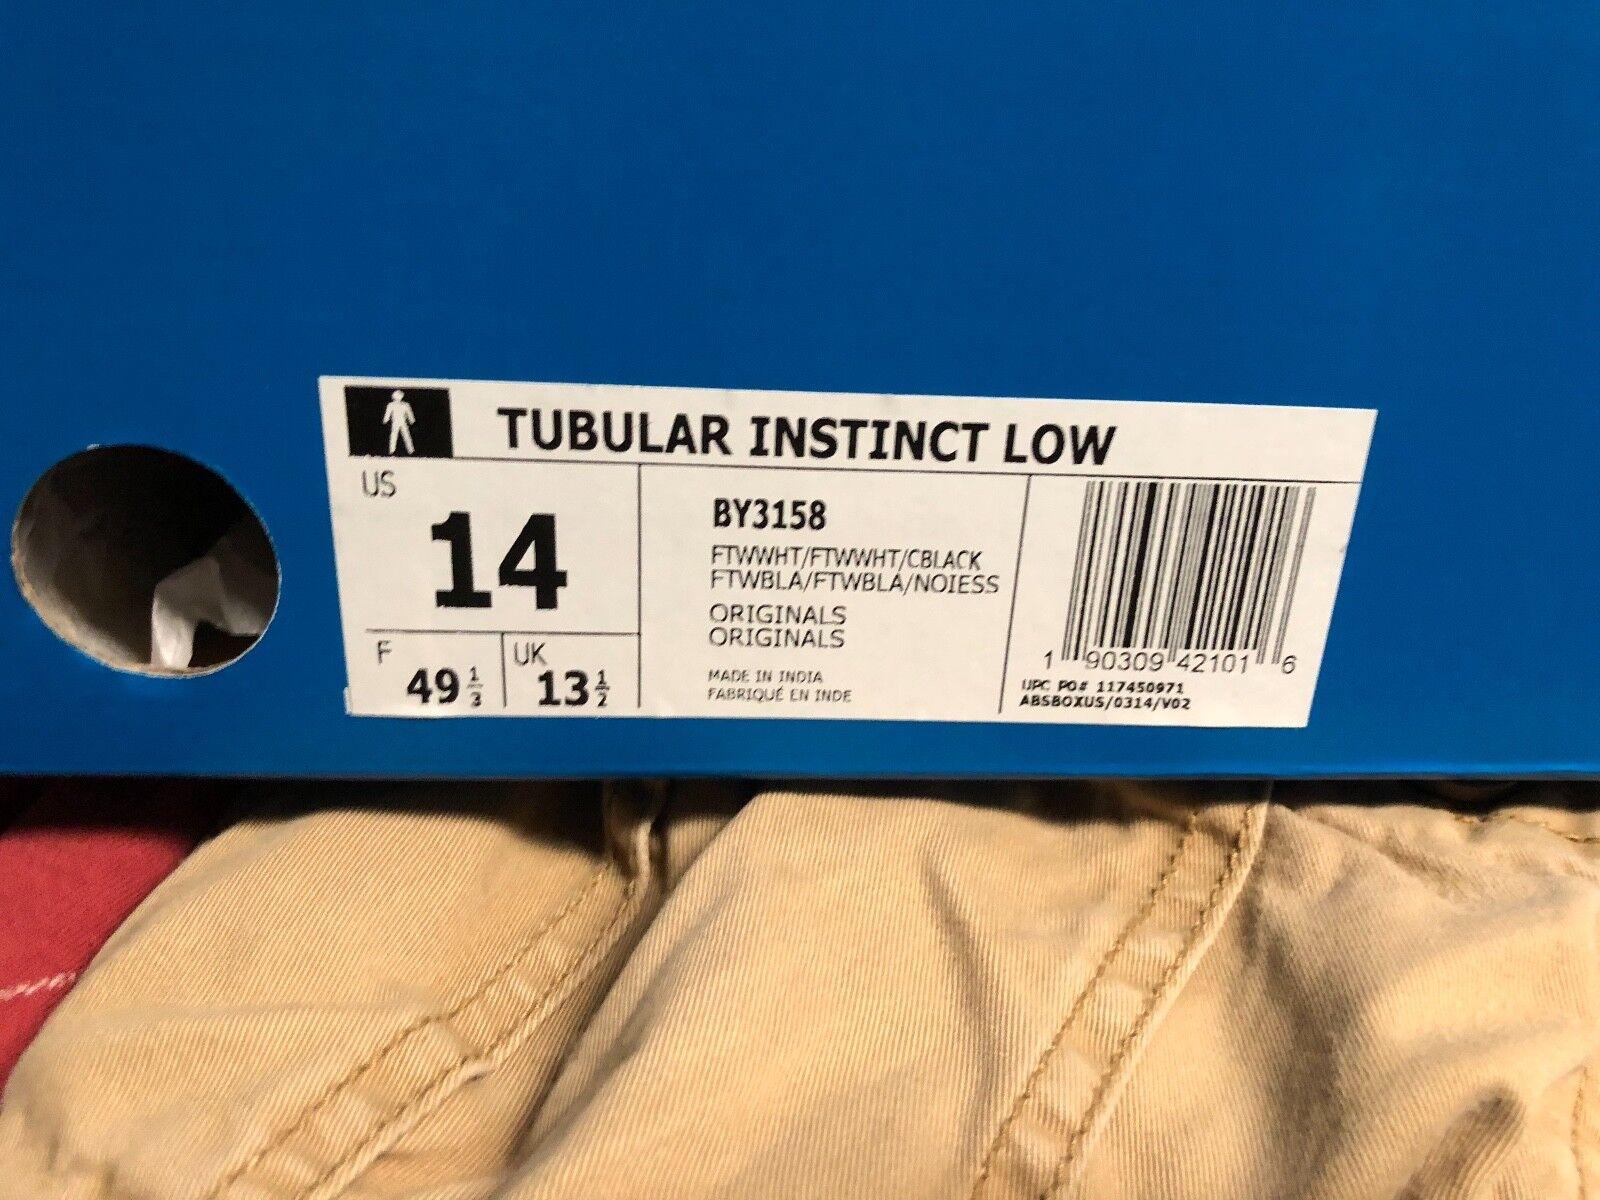 Adidas originals tubuläre instinkt wohl niedrigen wohl instinkt männer 6d8455